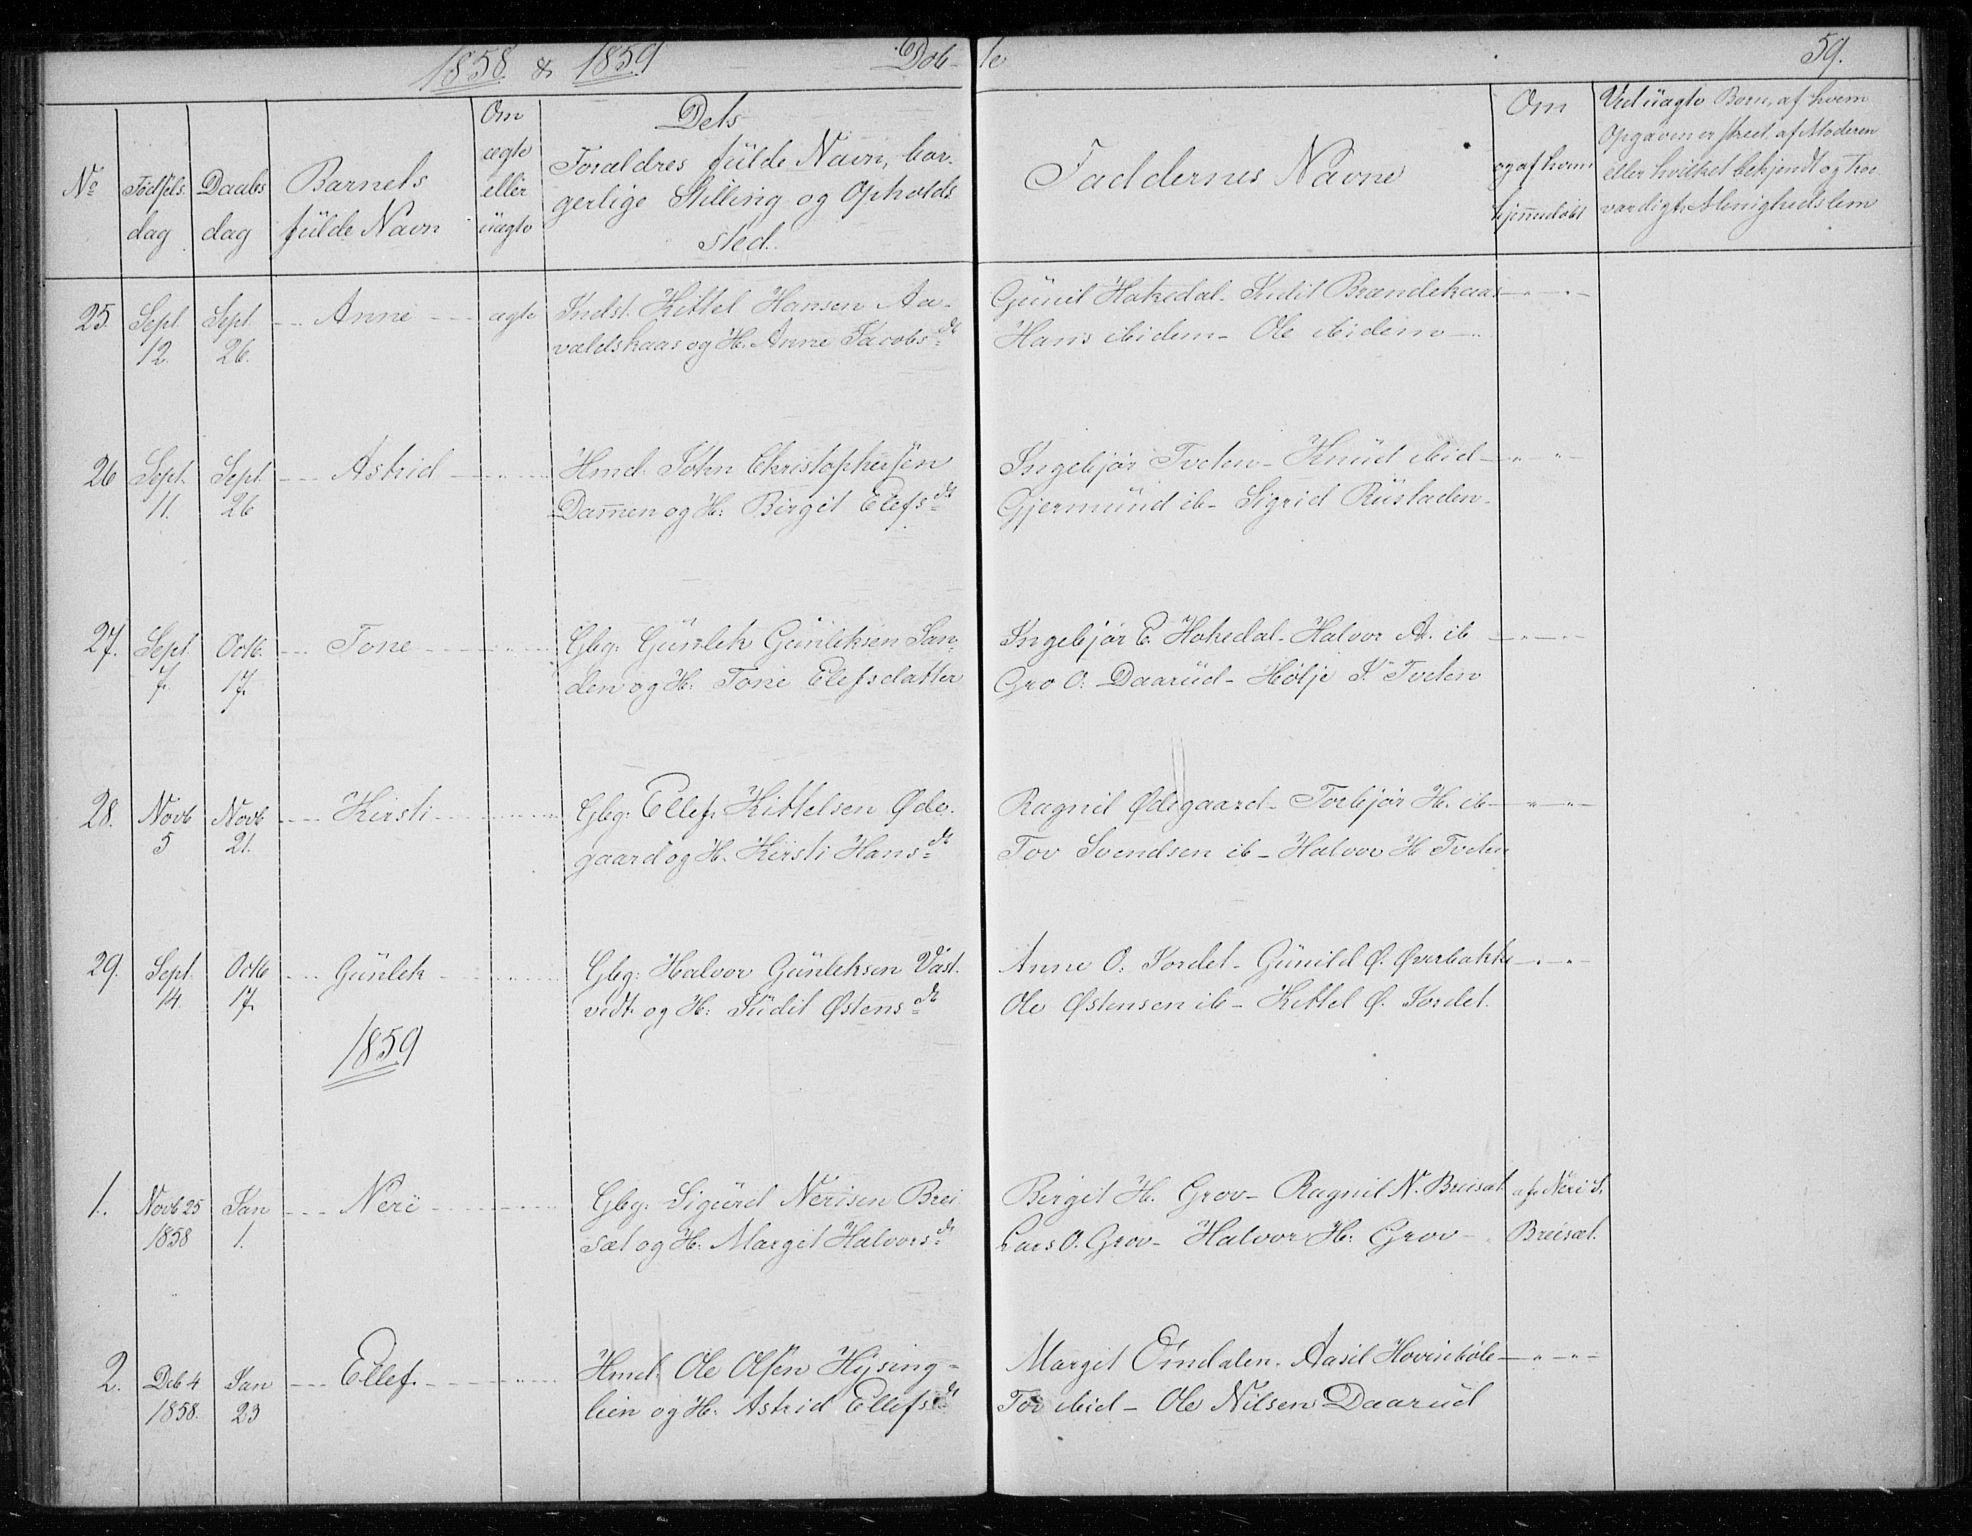 SAKO, Gransherad kirkebøker, F/Fb/L0003: Ministerialbok nr. II 3, 1844-1859, s. 59